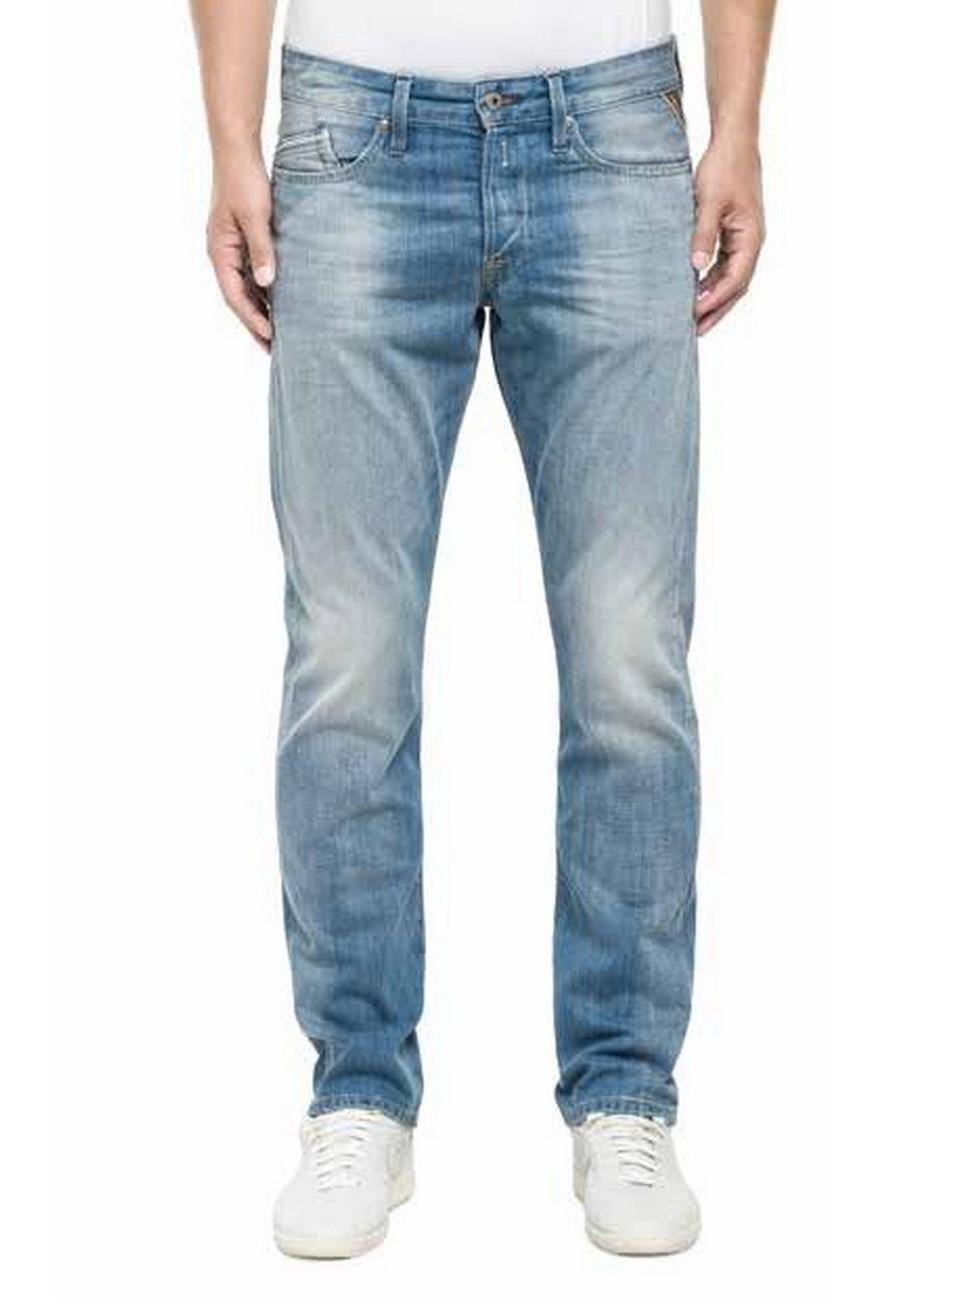 replay herren jeans waitom regular fit slim leg blau deep blue ebay. Black Bedroom Furniture Sets. Home Design Ideas